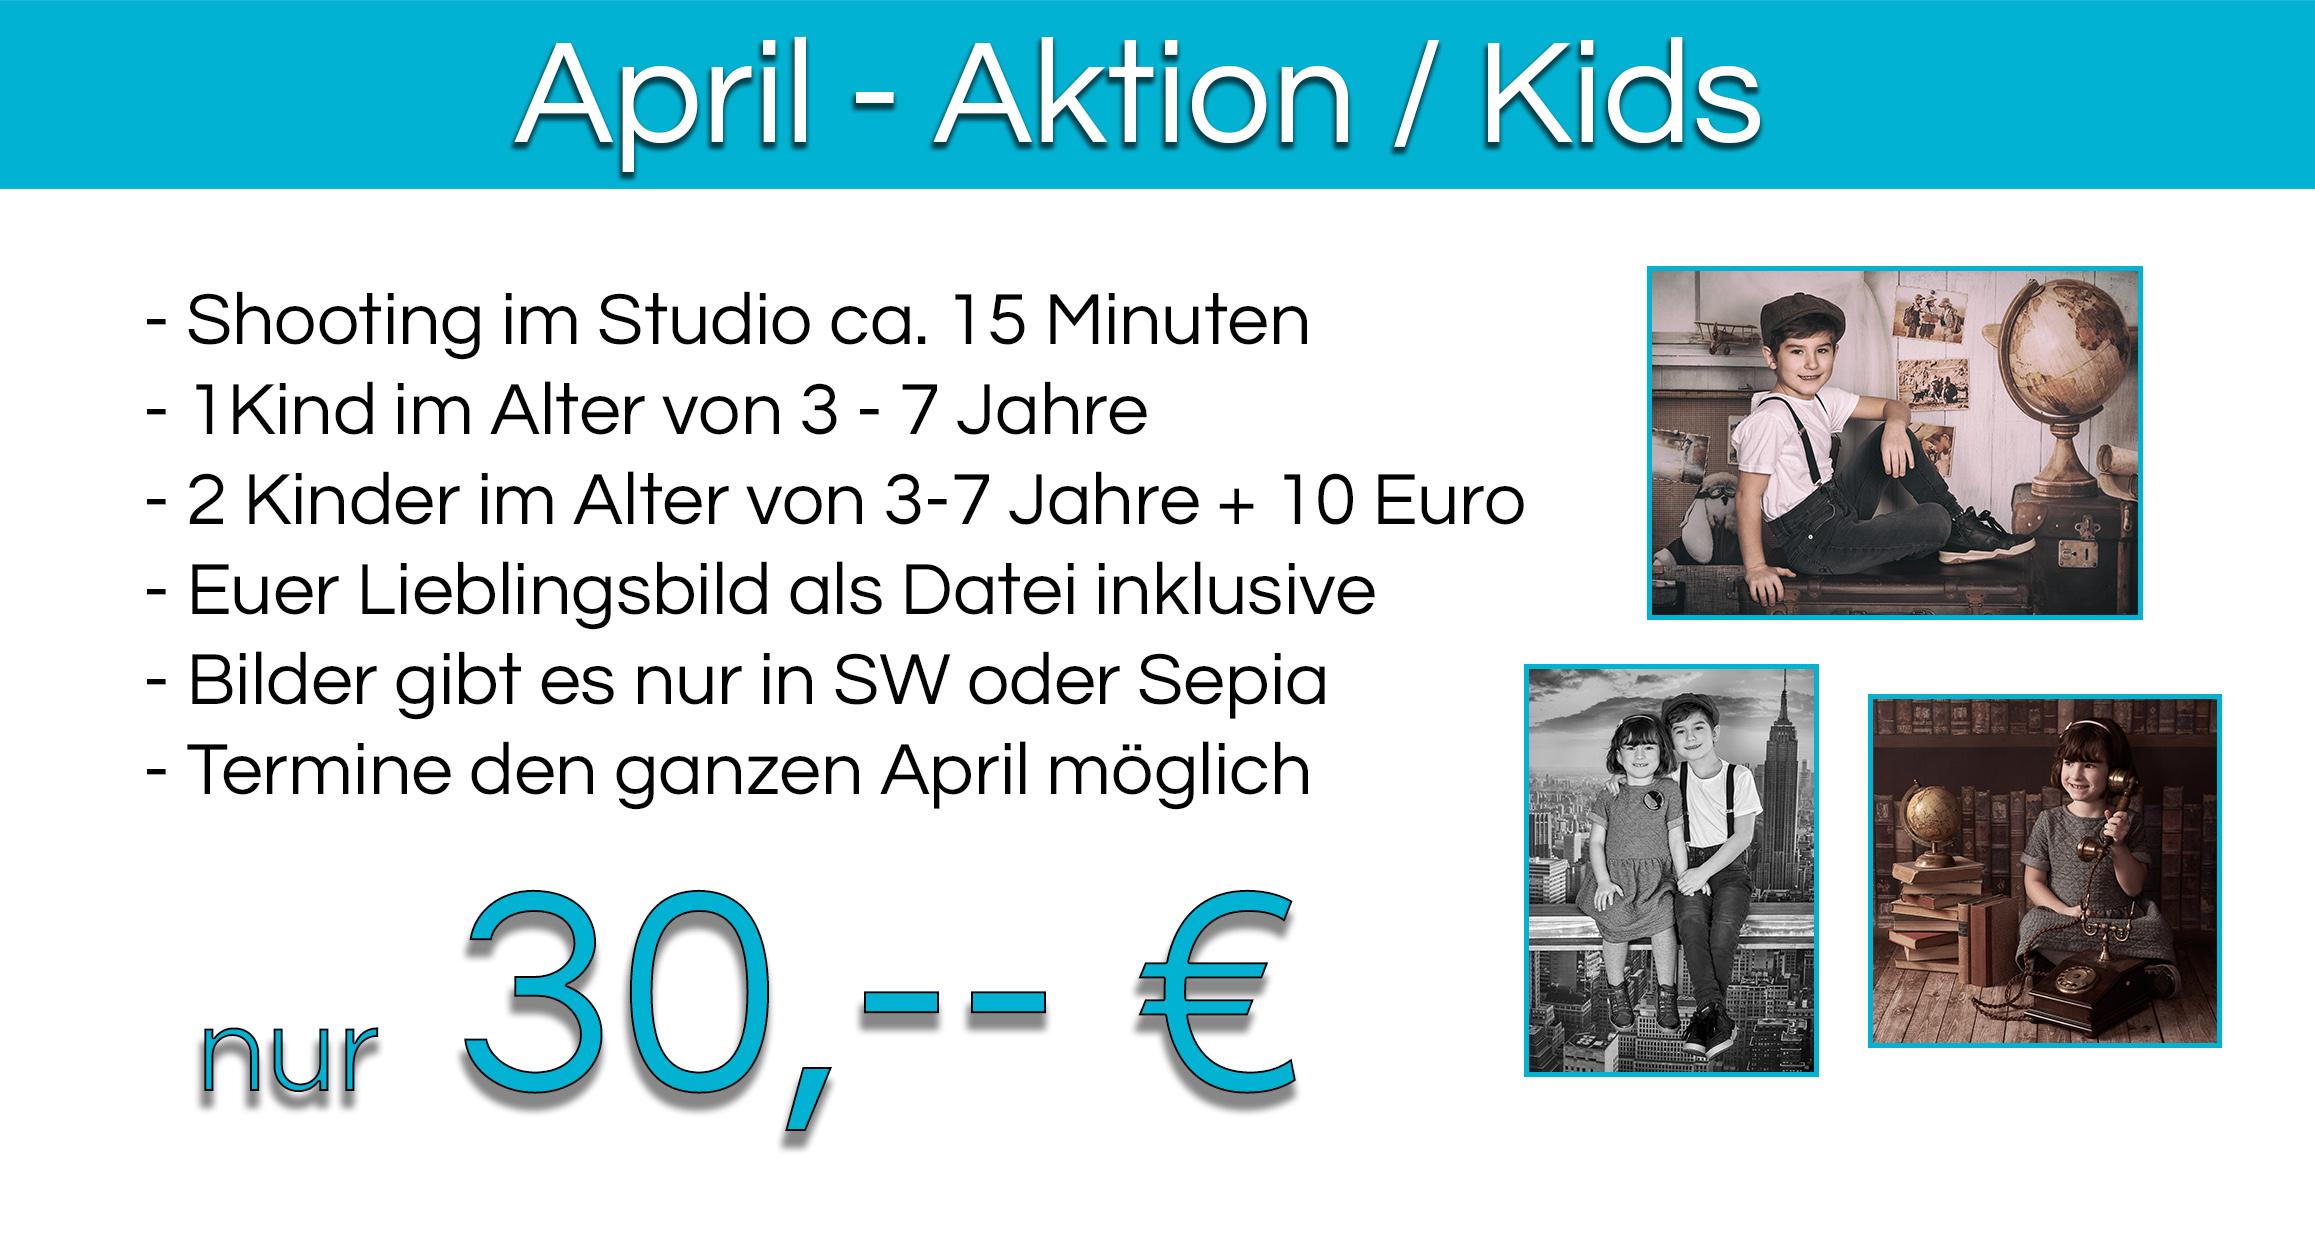 http://merget-fotografie.de/wordpress/wp-content/uploads/2017/02/April-Kids.jpg